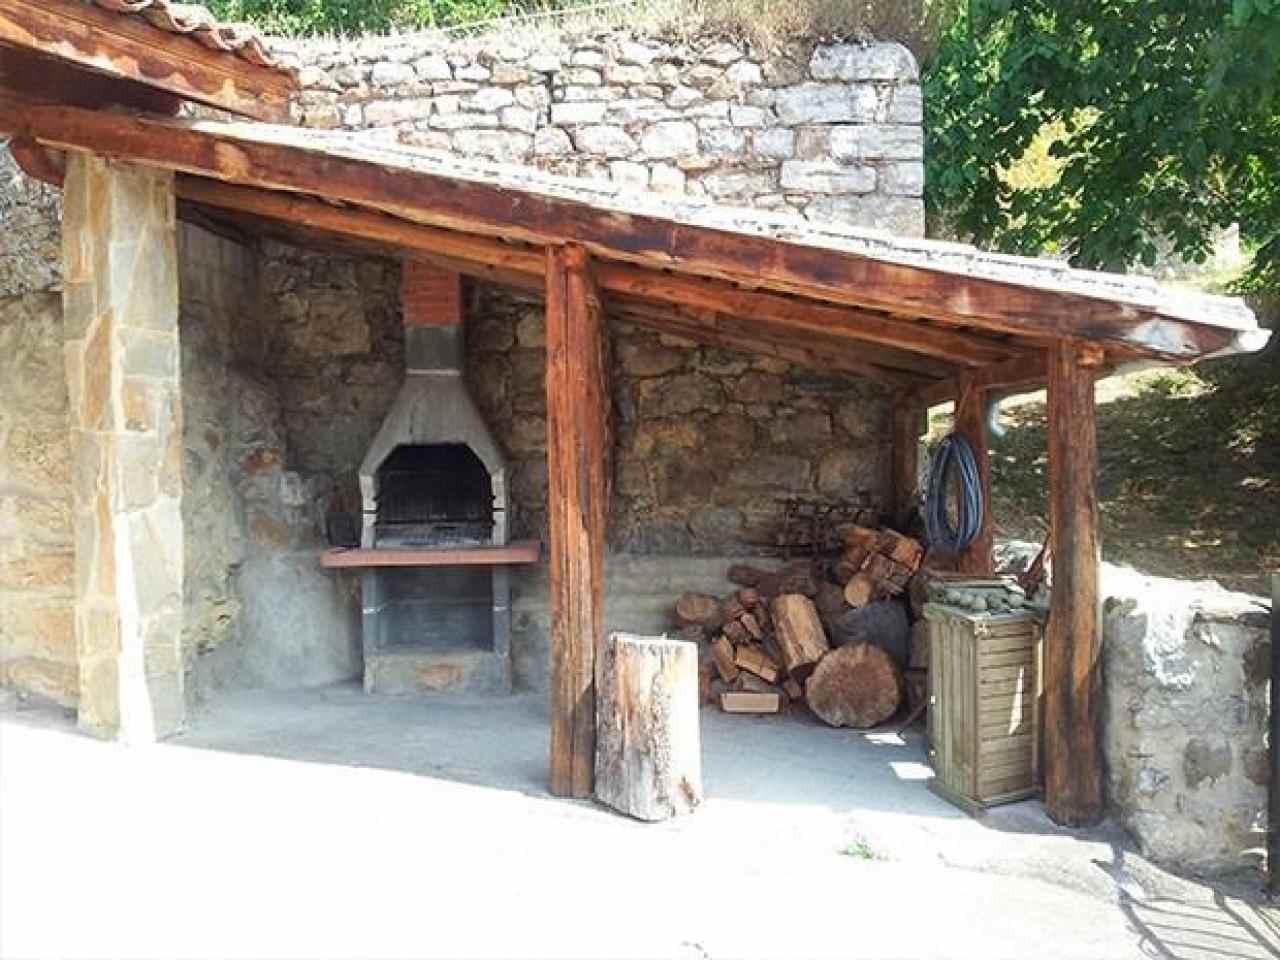 Alquiler de habitaciones Carrea, Asturias